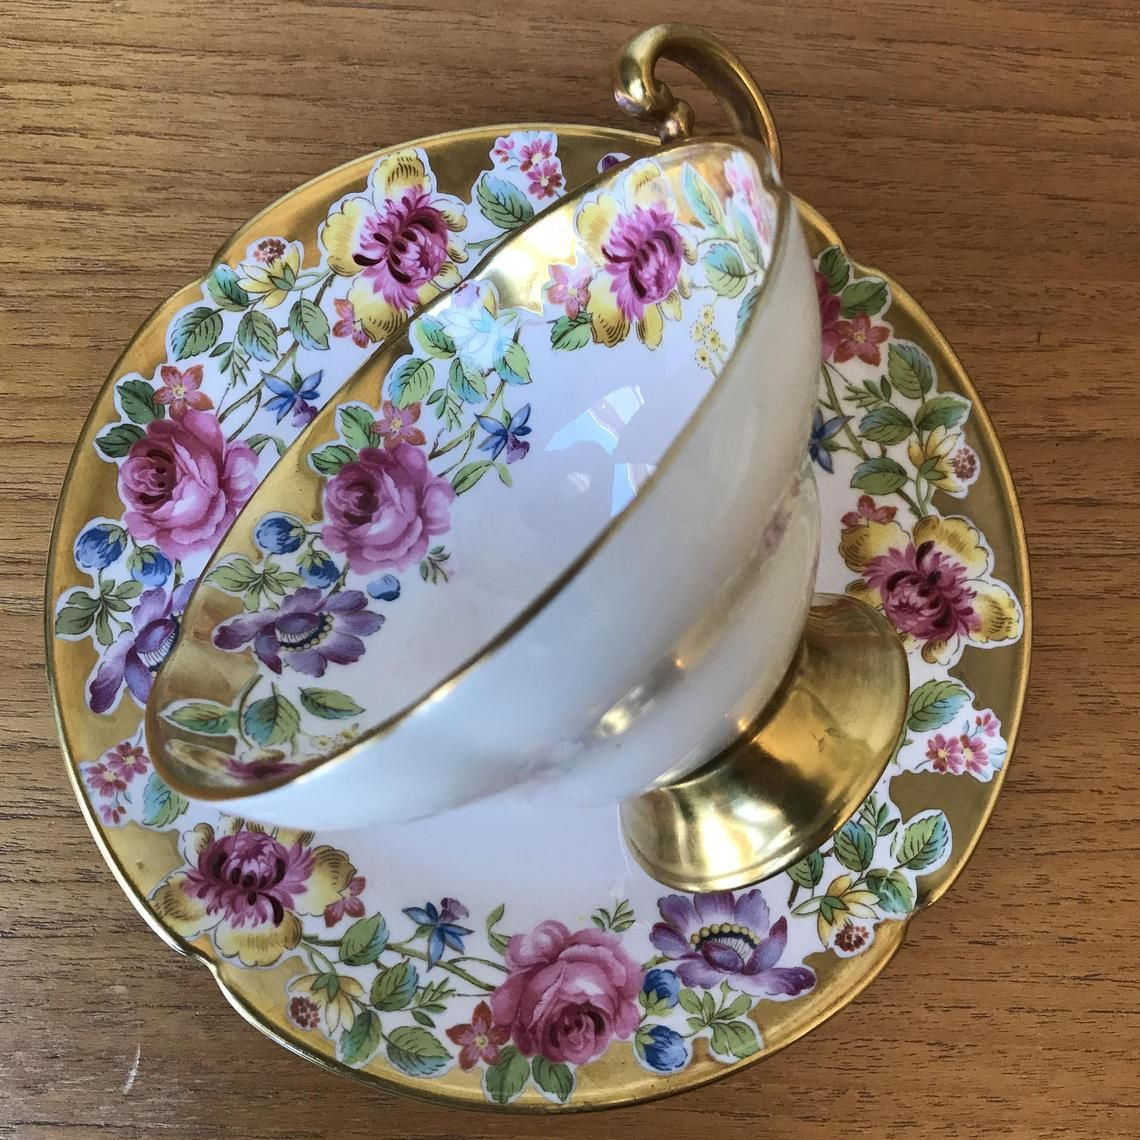 Alte Royale Swansea Vintage Teetasse Und Etsy Teetasse Vintage Teetassen Vintage Tee